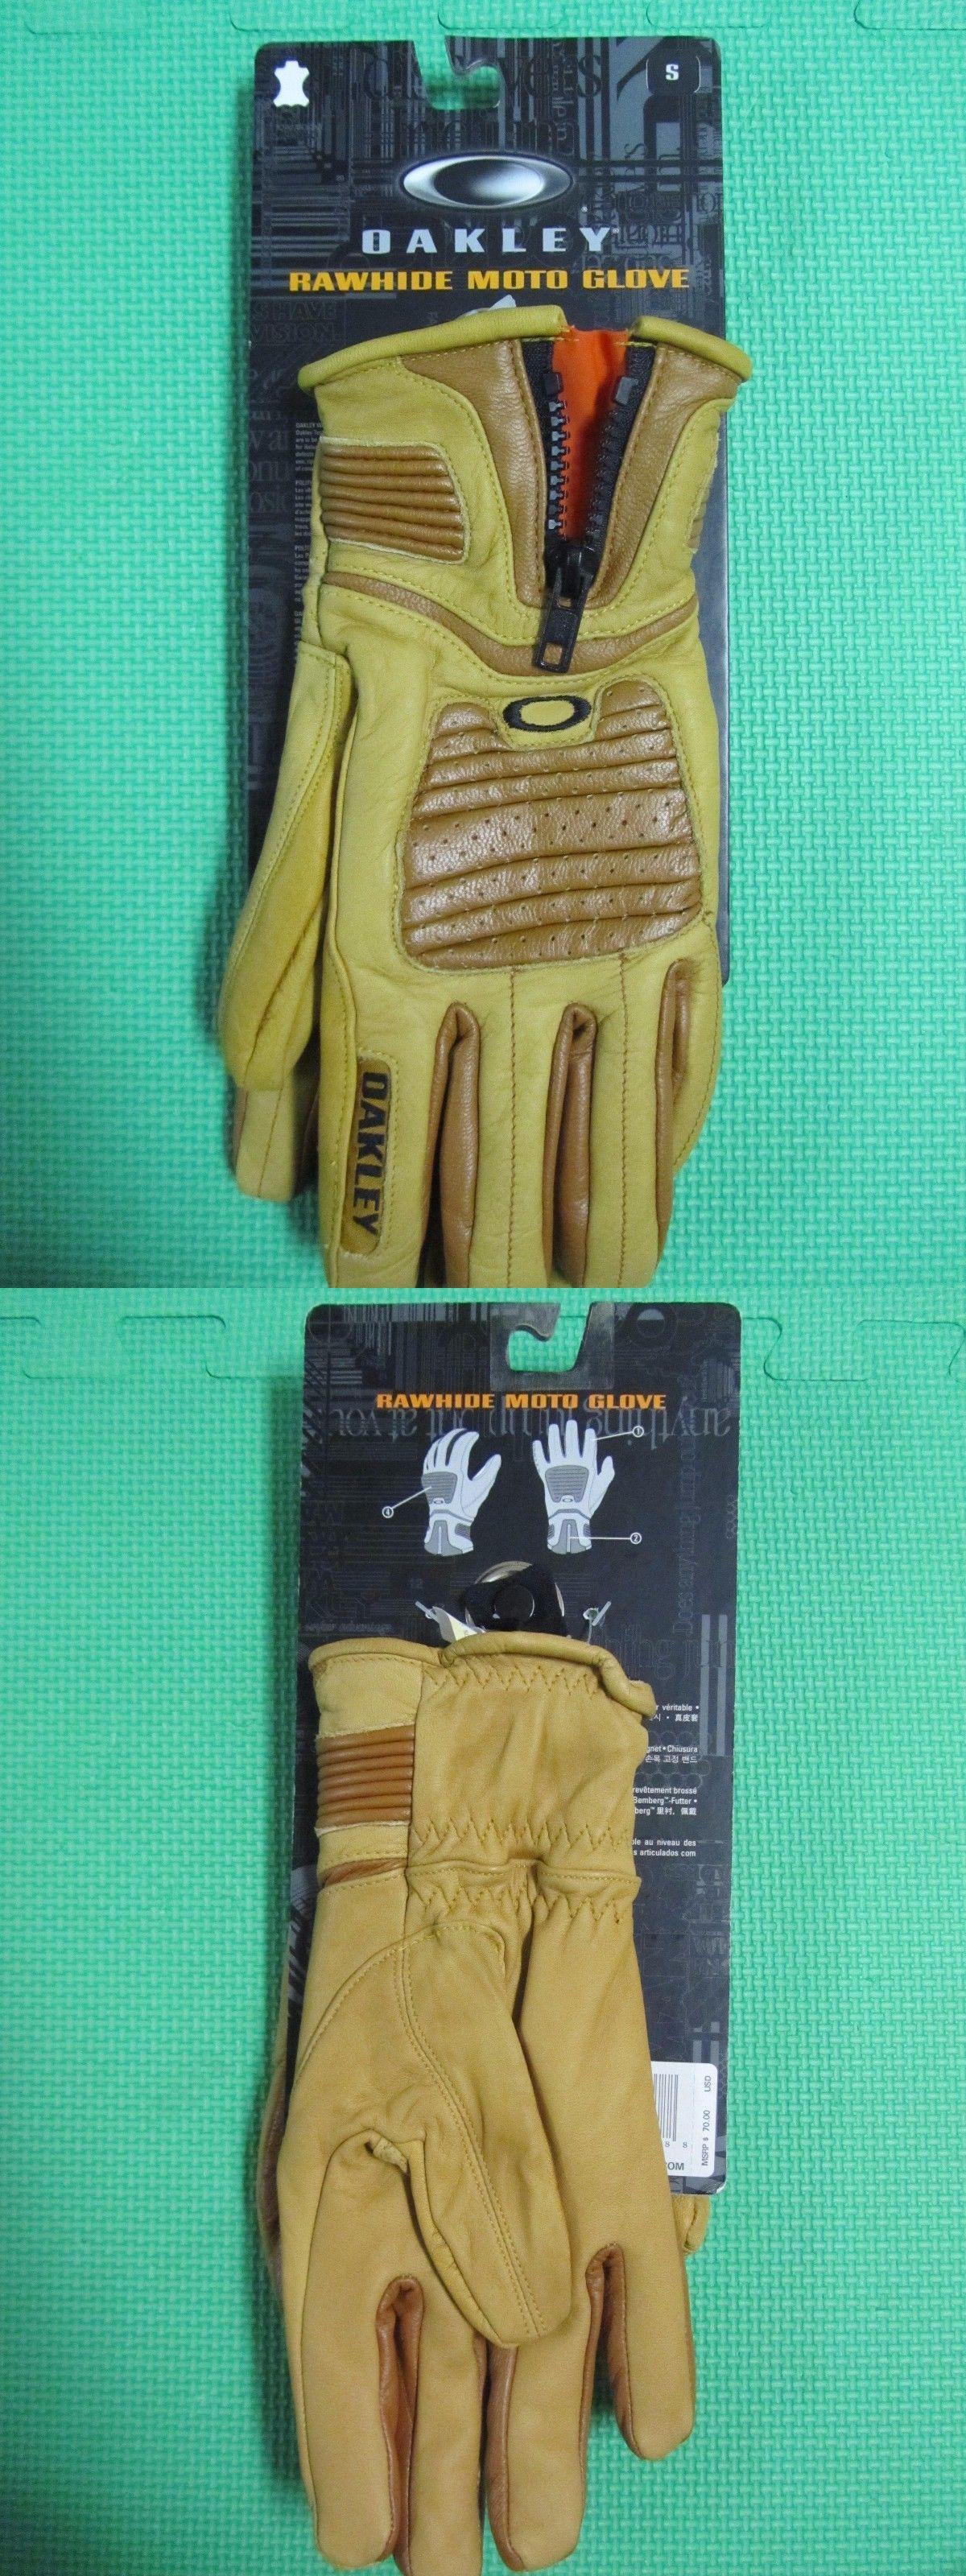 Gloves oakley rawhide moto gloves ue buy it now only on